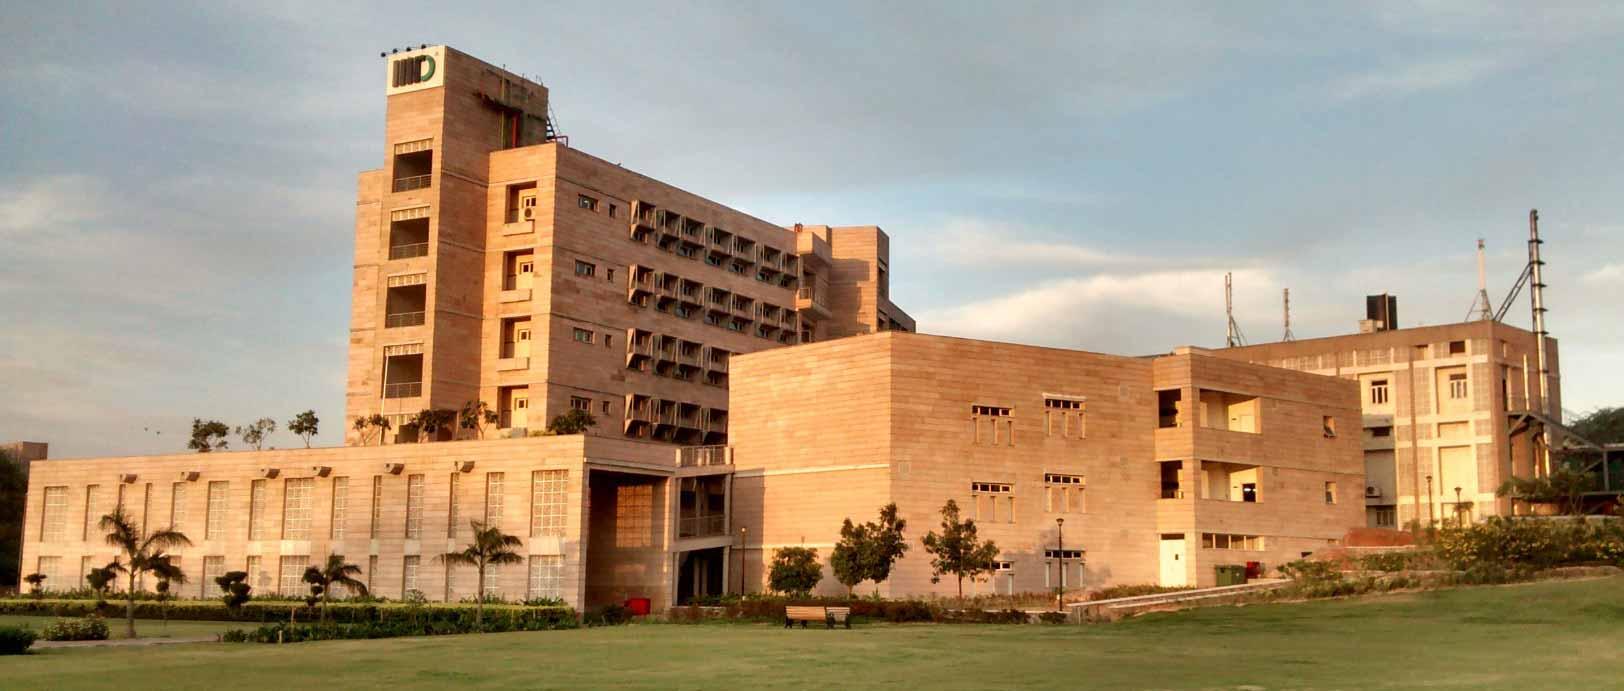 Indraprastha Institute of Information Technology, Delhi - Wikiwand